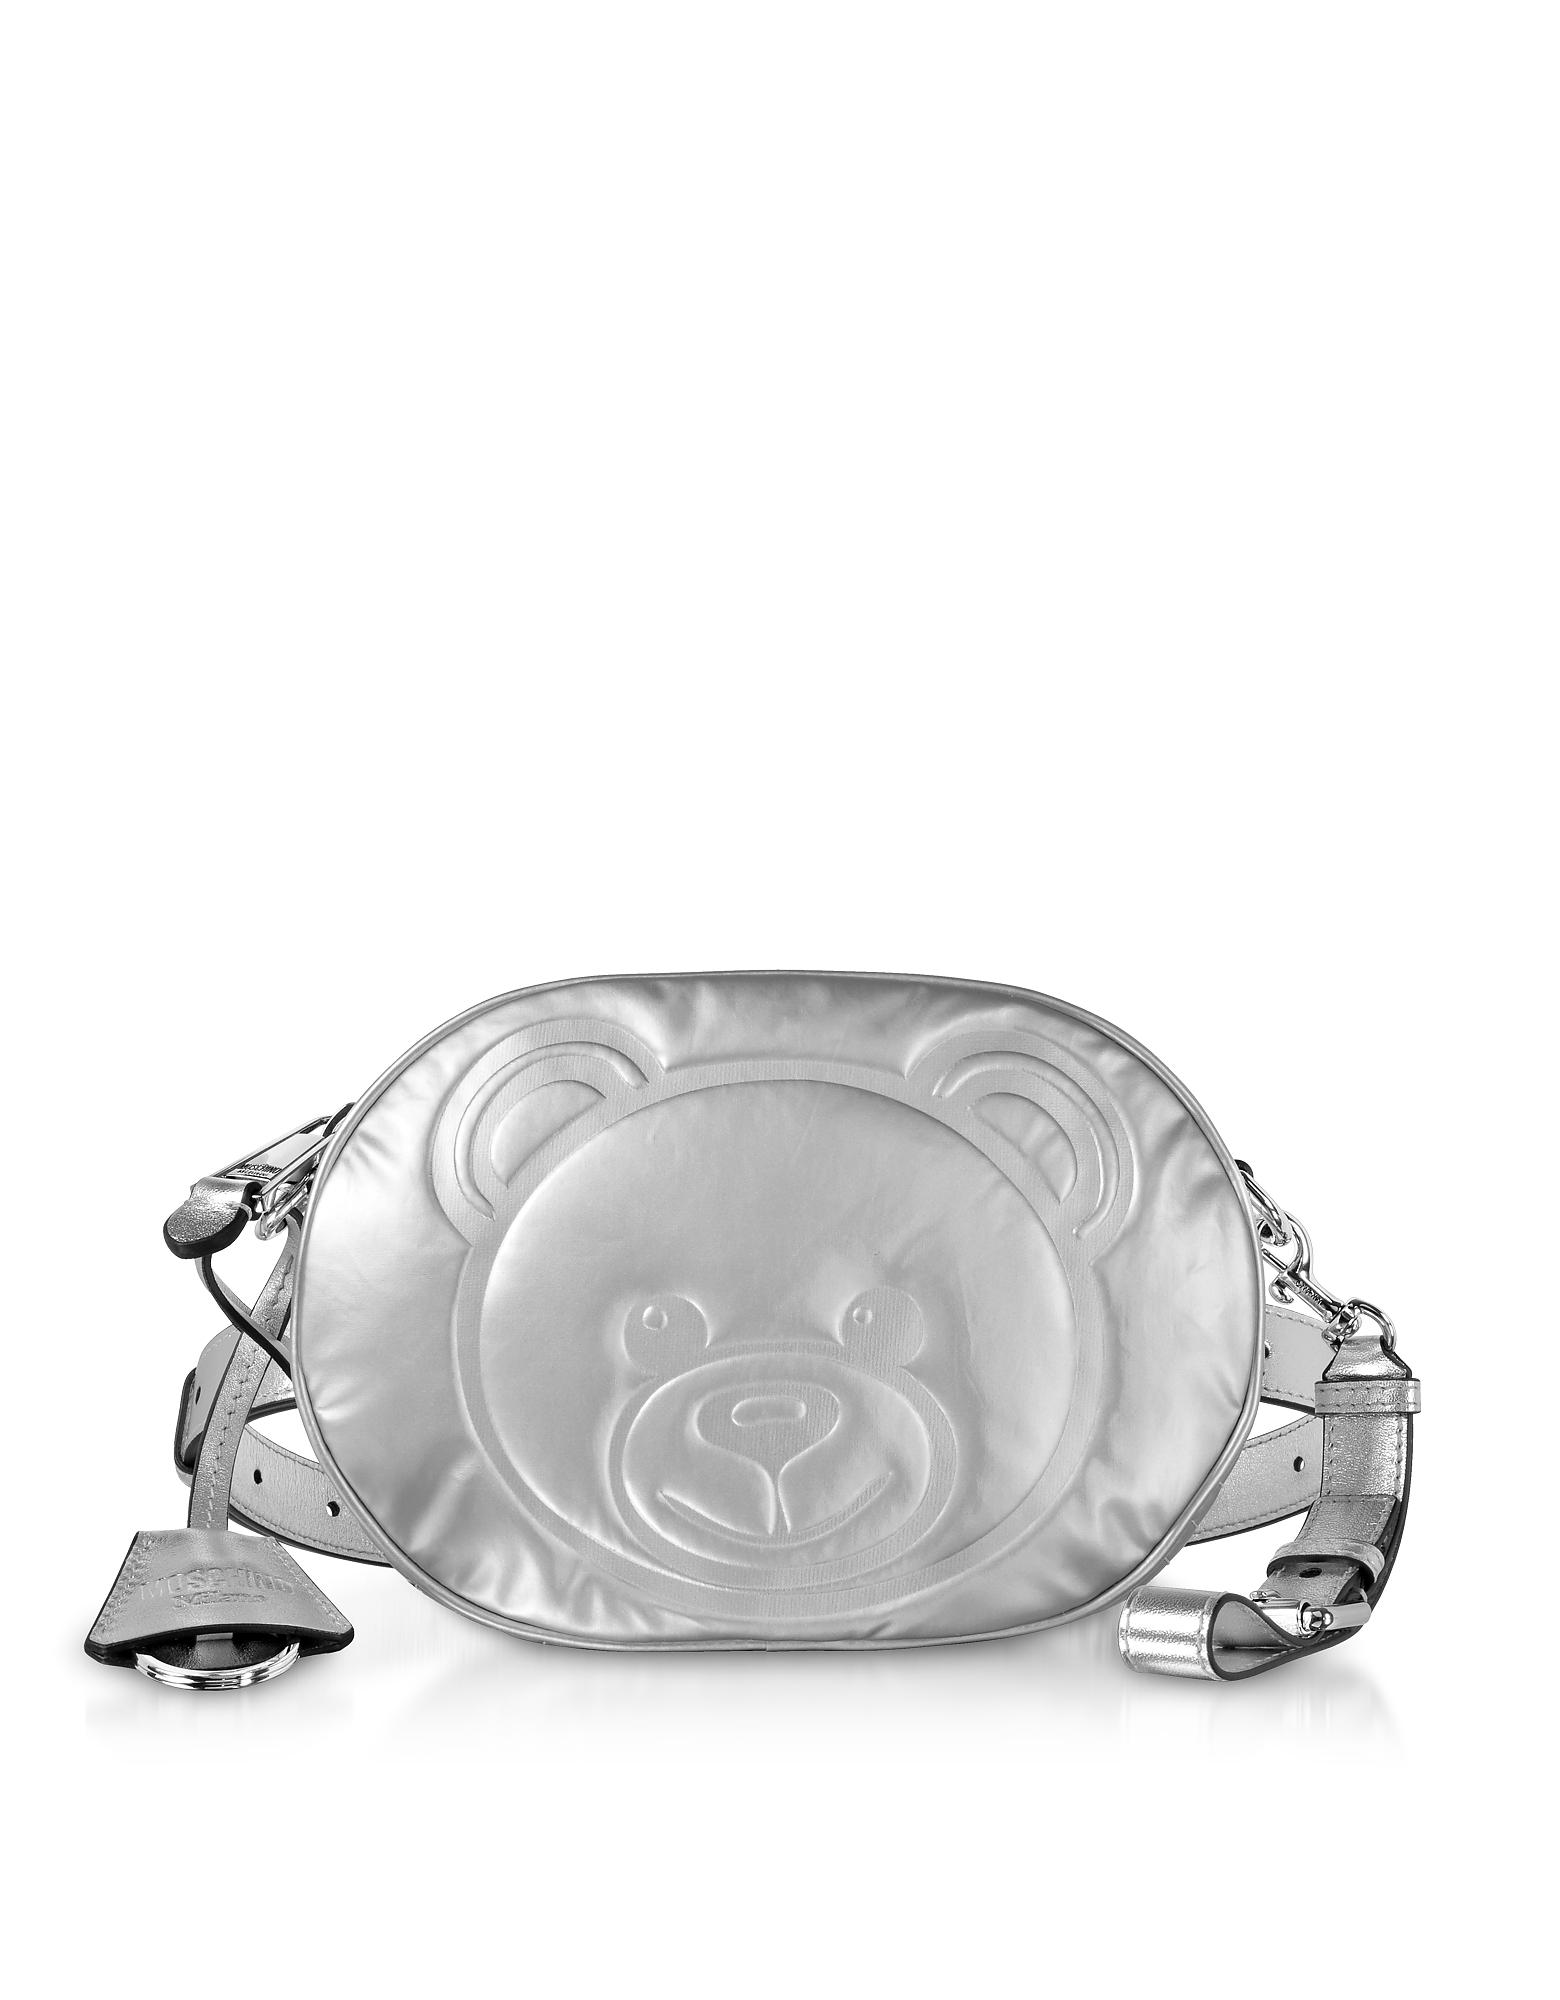 Moschino Handbags, Teddy Bear Laminated Leather Belt Bag